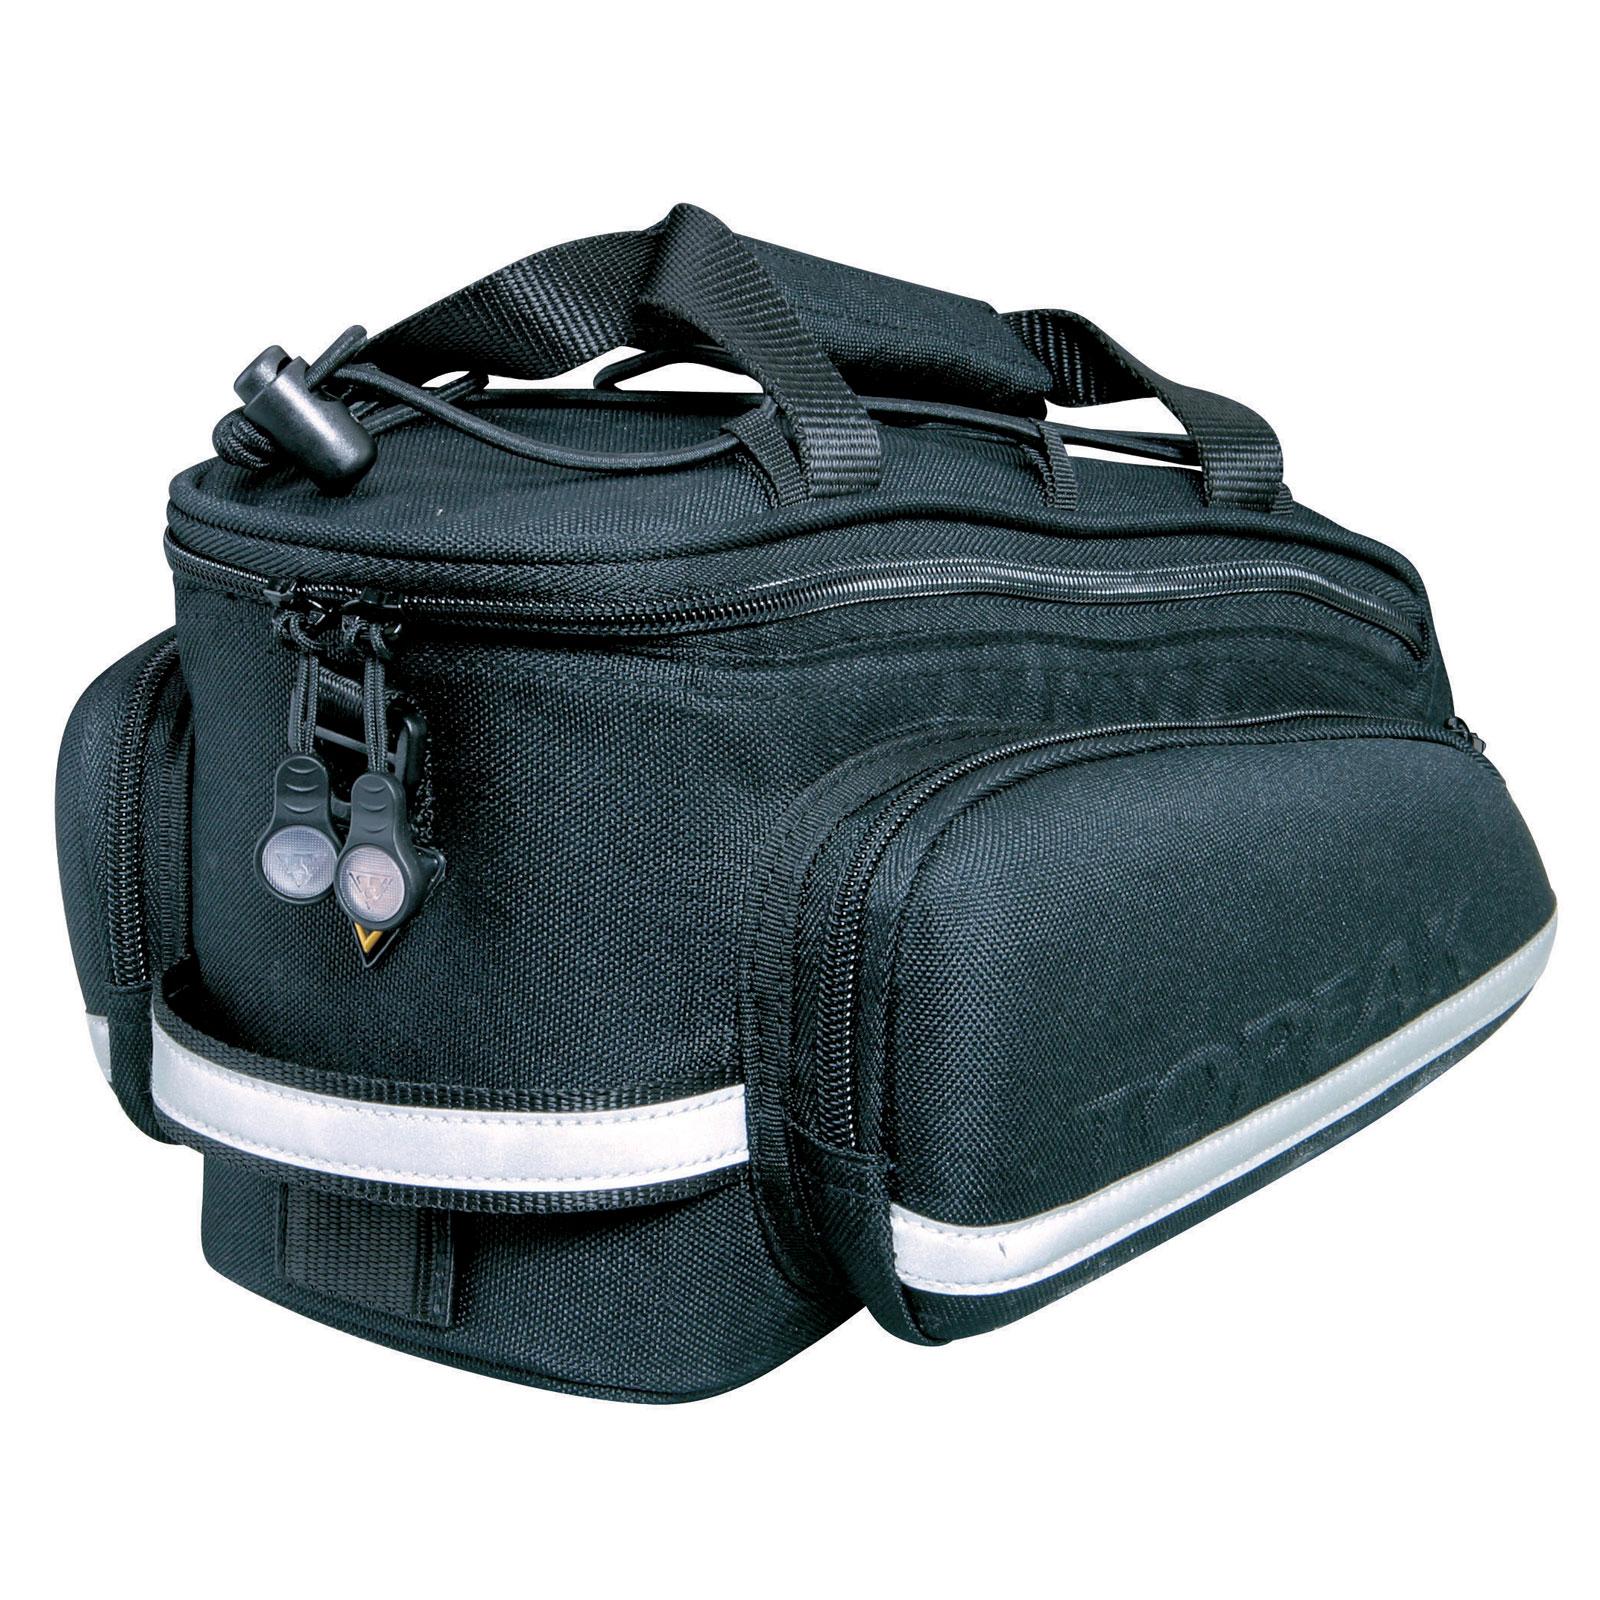 TOPEAK RX TrunkBag DXP High Capacity Rear Rack Bike Bag W...